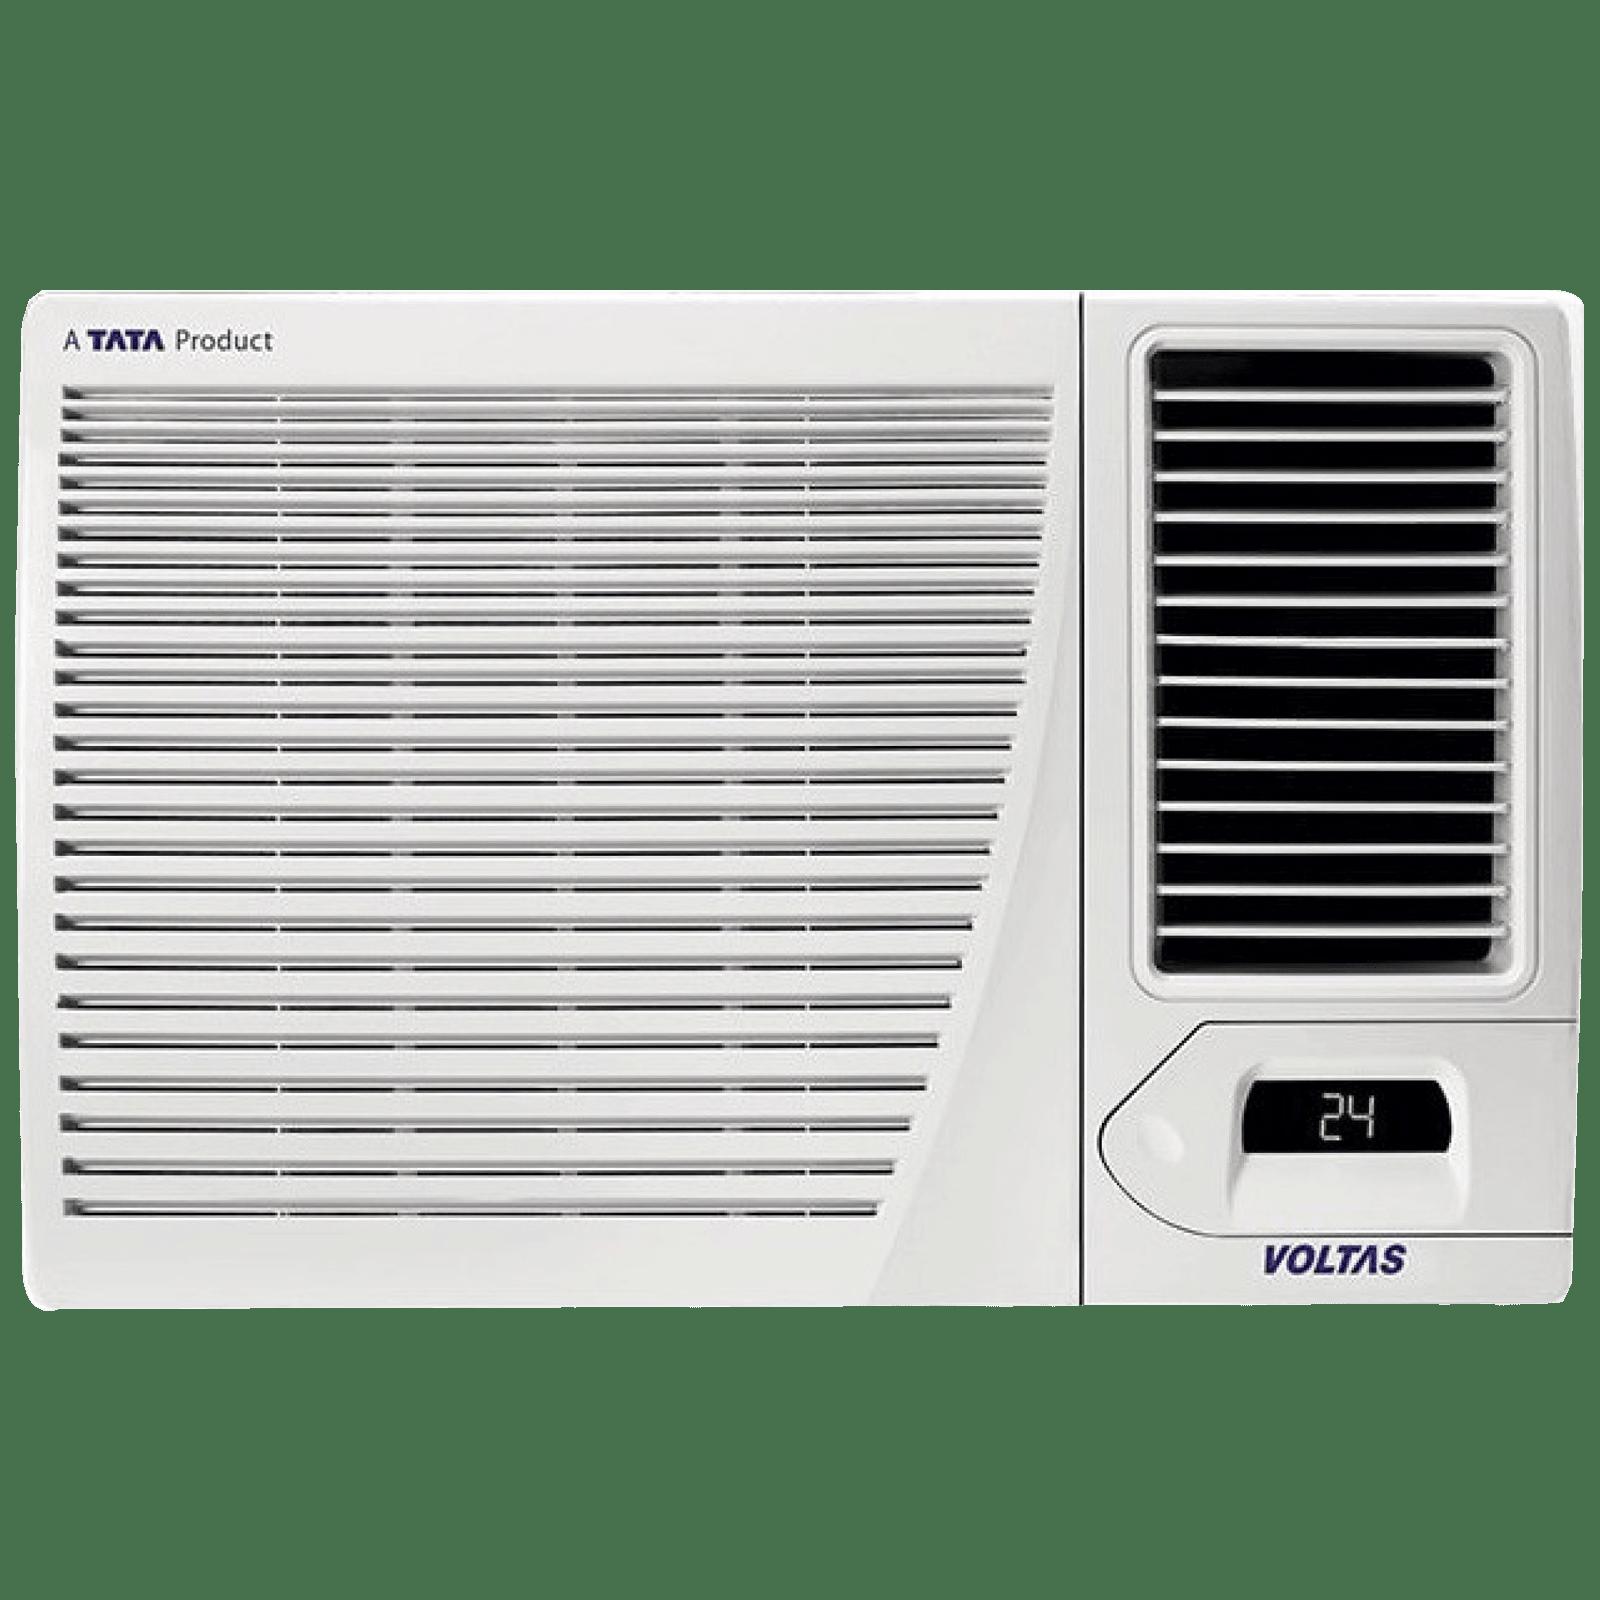 Voltas 1.5 Ton 3 Star Inverter Window AC (Hot and Cold, Copper Condenser, 18H CZP, White)